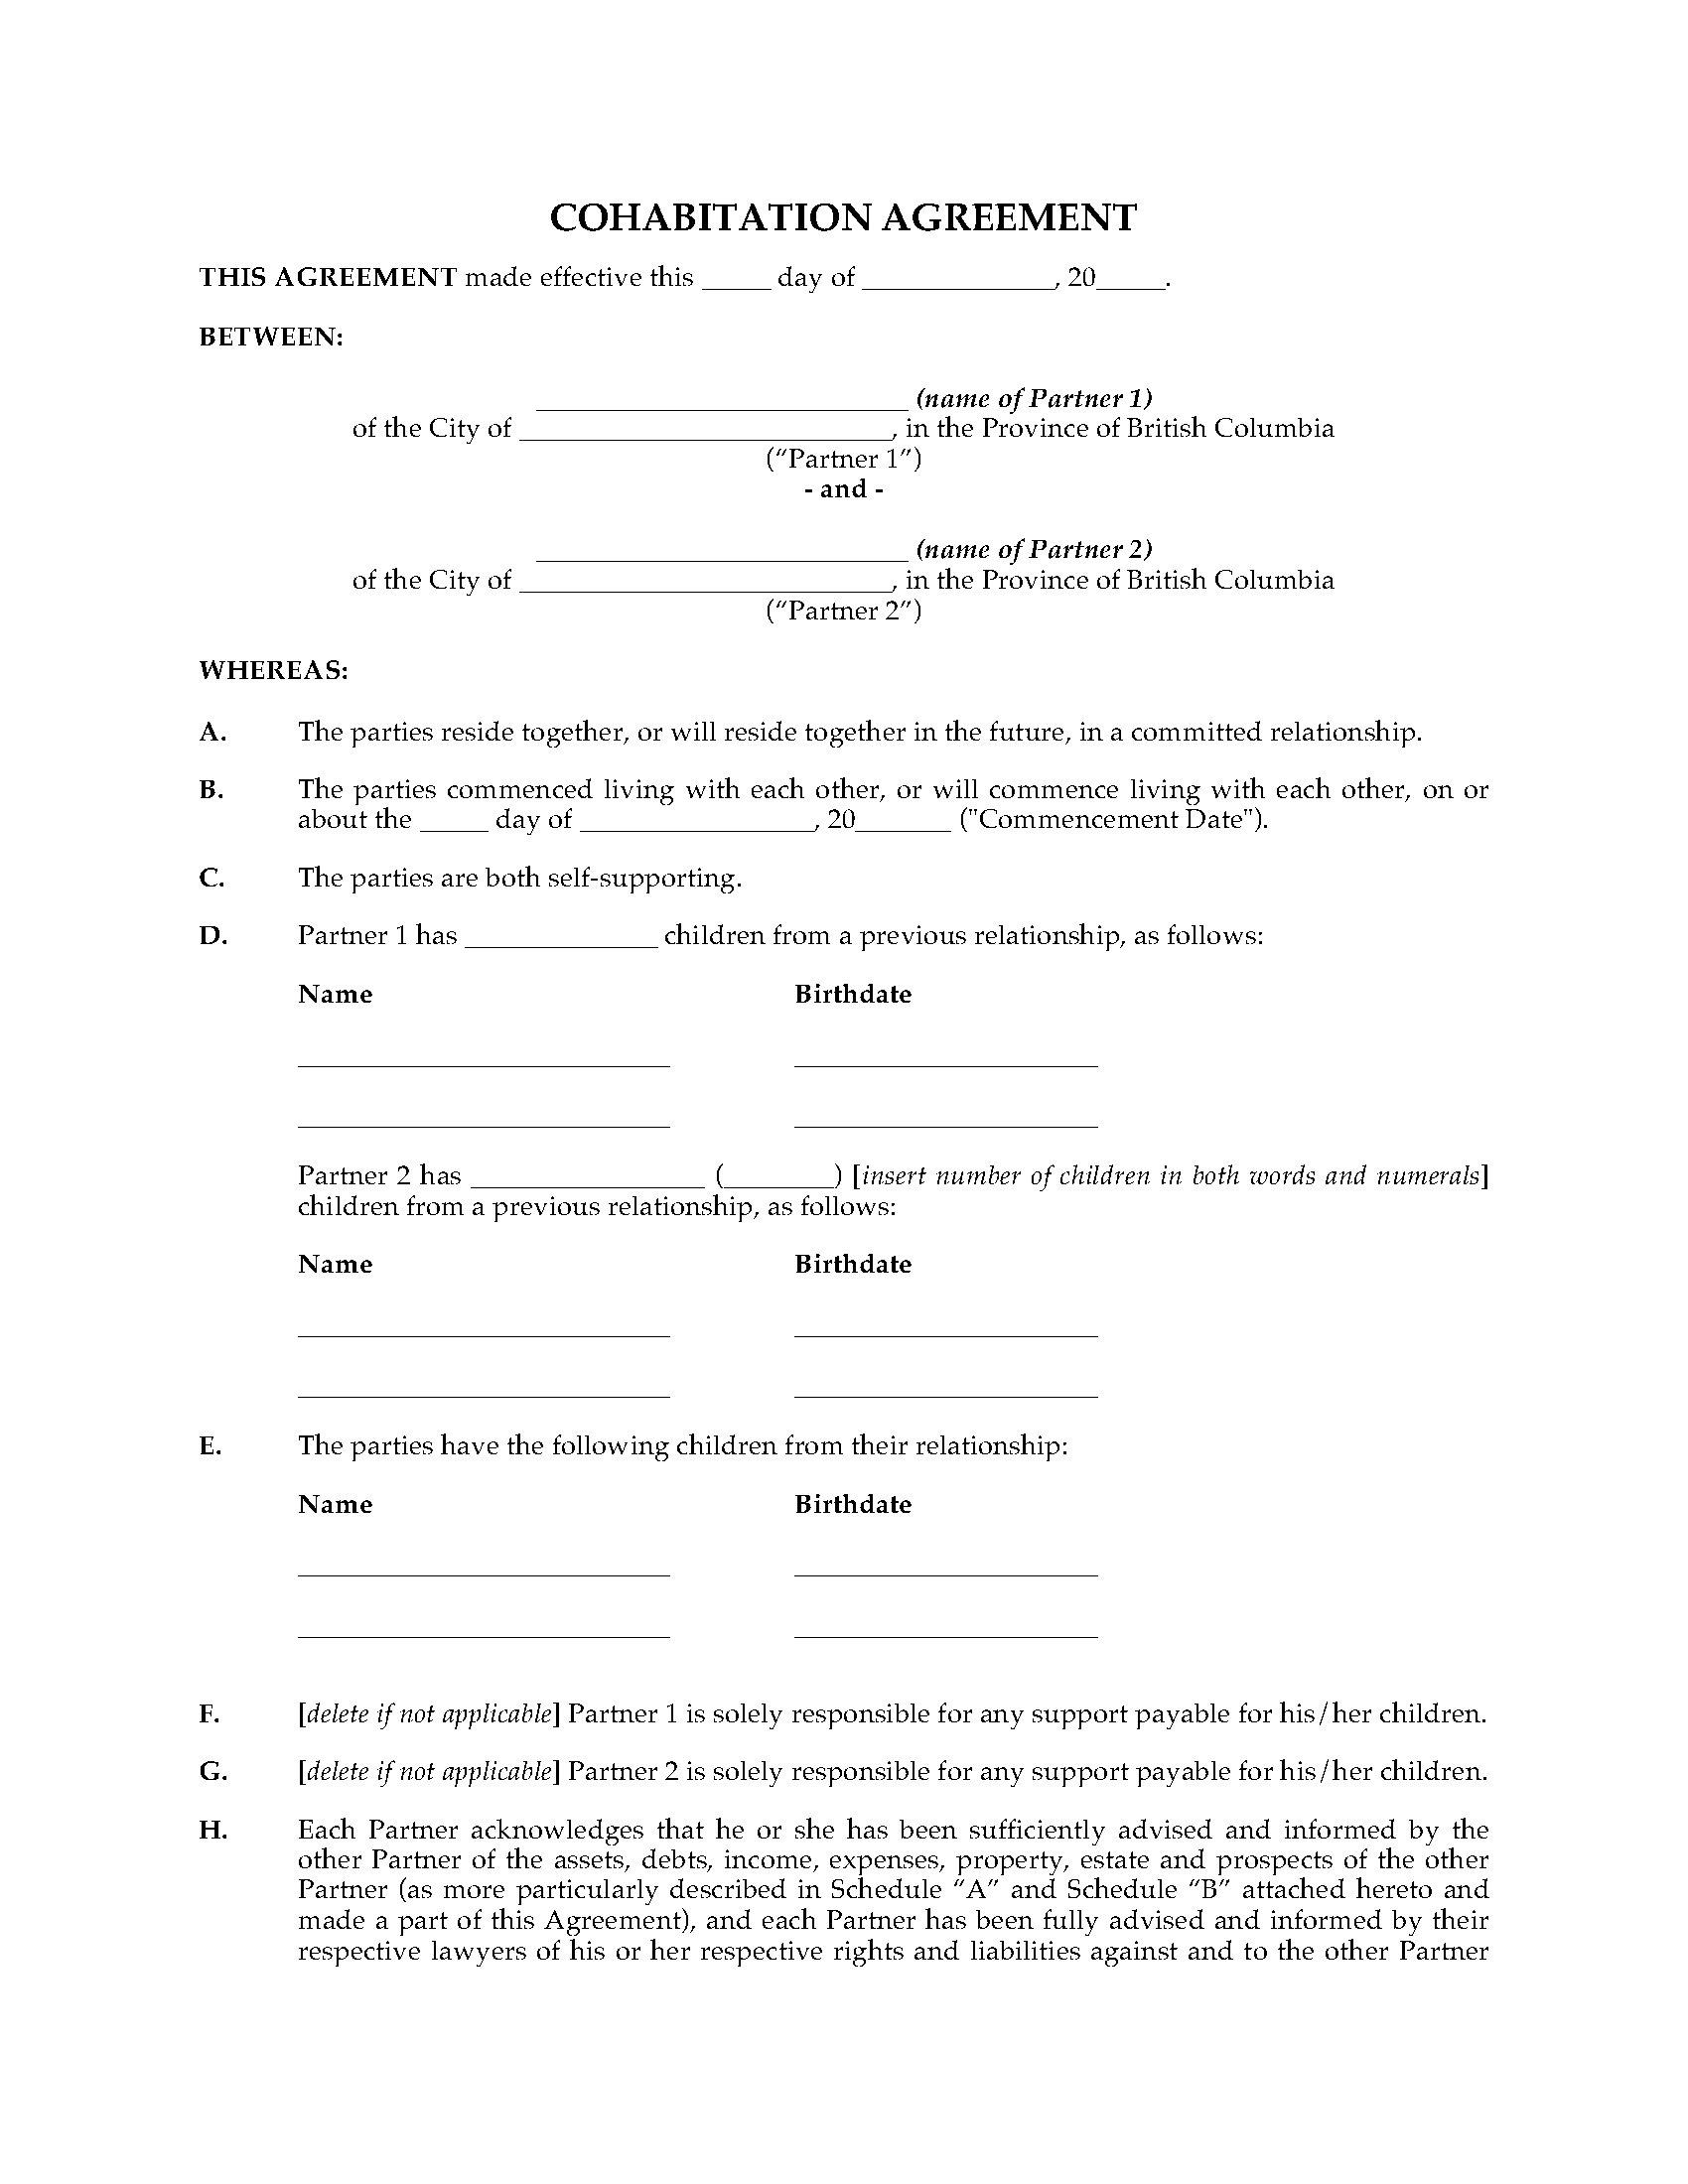 Cohabitation Agreement Template Saskatchewan